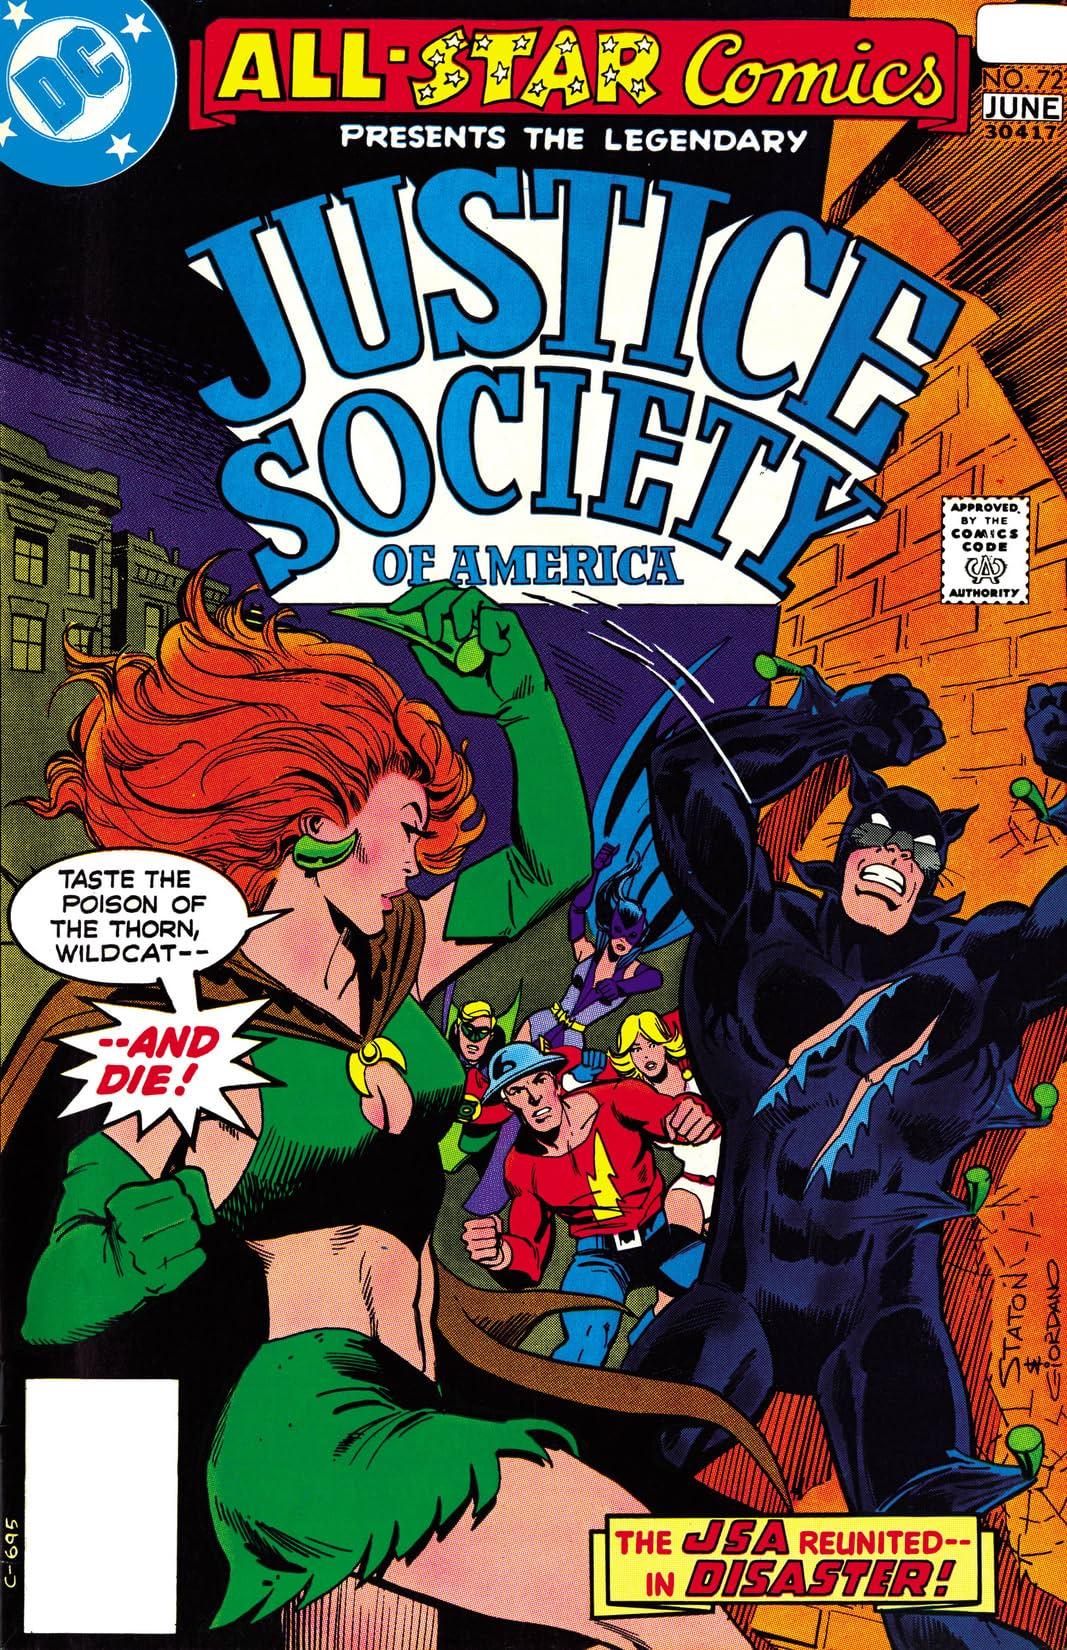 All-Star Comics #72